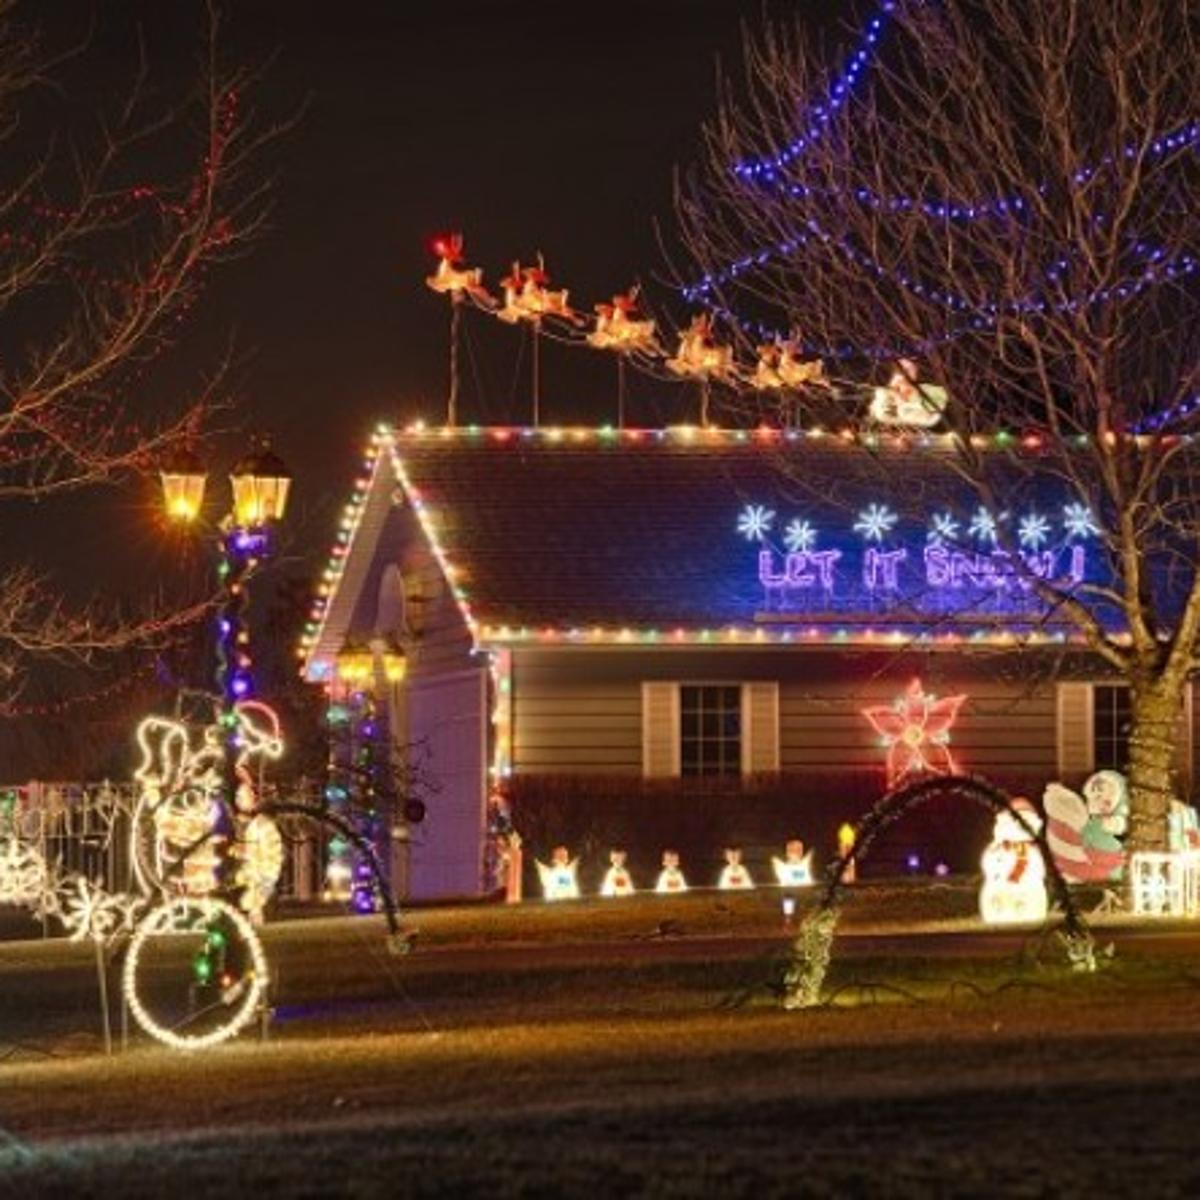 112th Lincoln Ne Christmas Lights 2019 Radio Station Light display a family affair at Bayer home | Local | journalstar.com